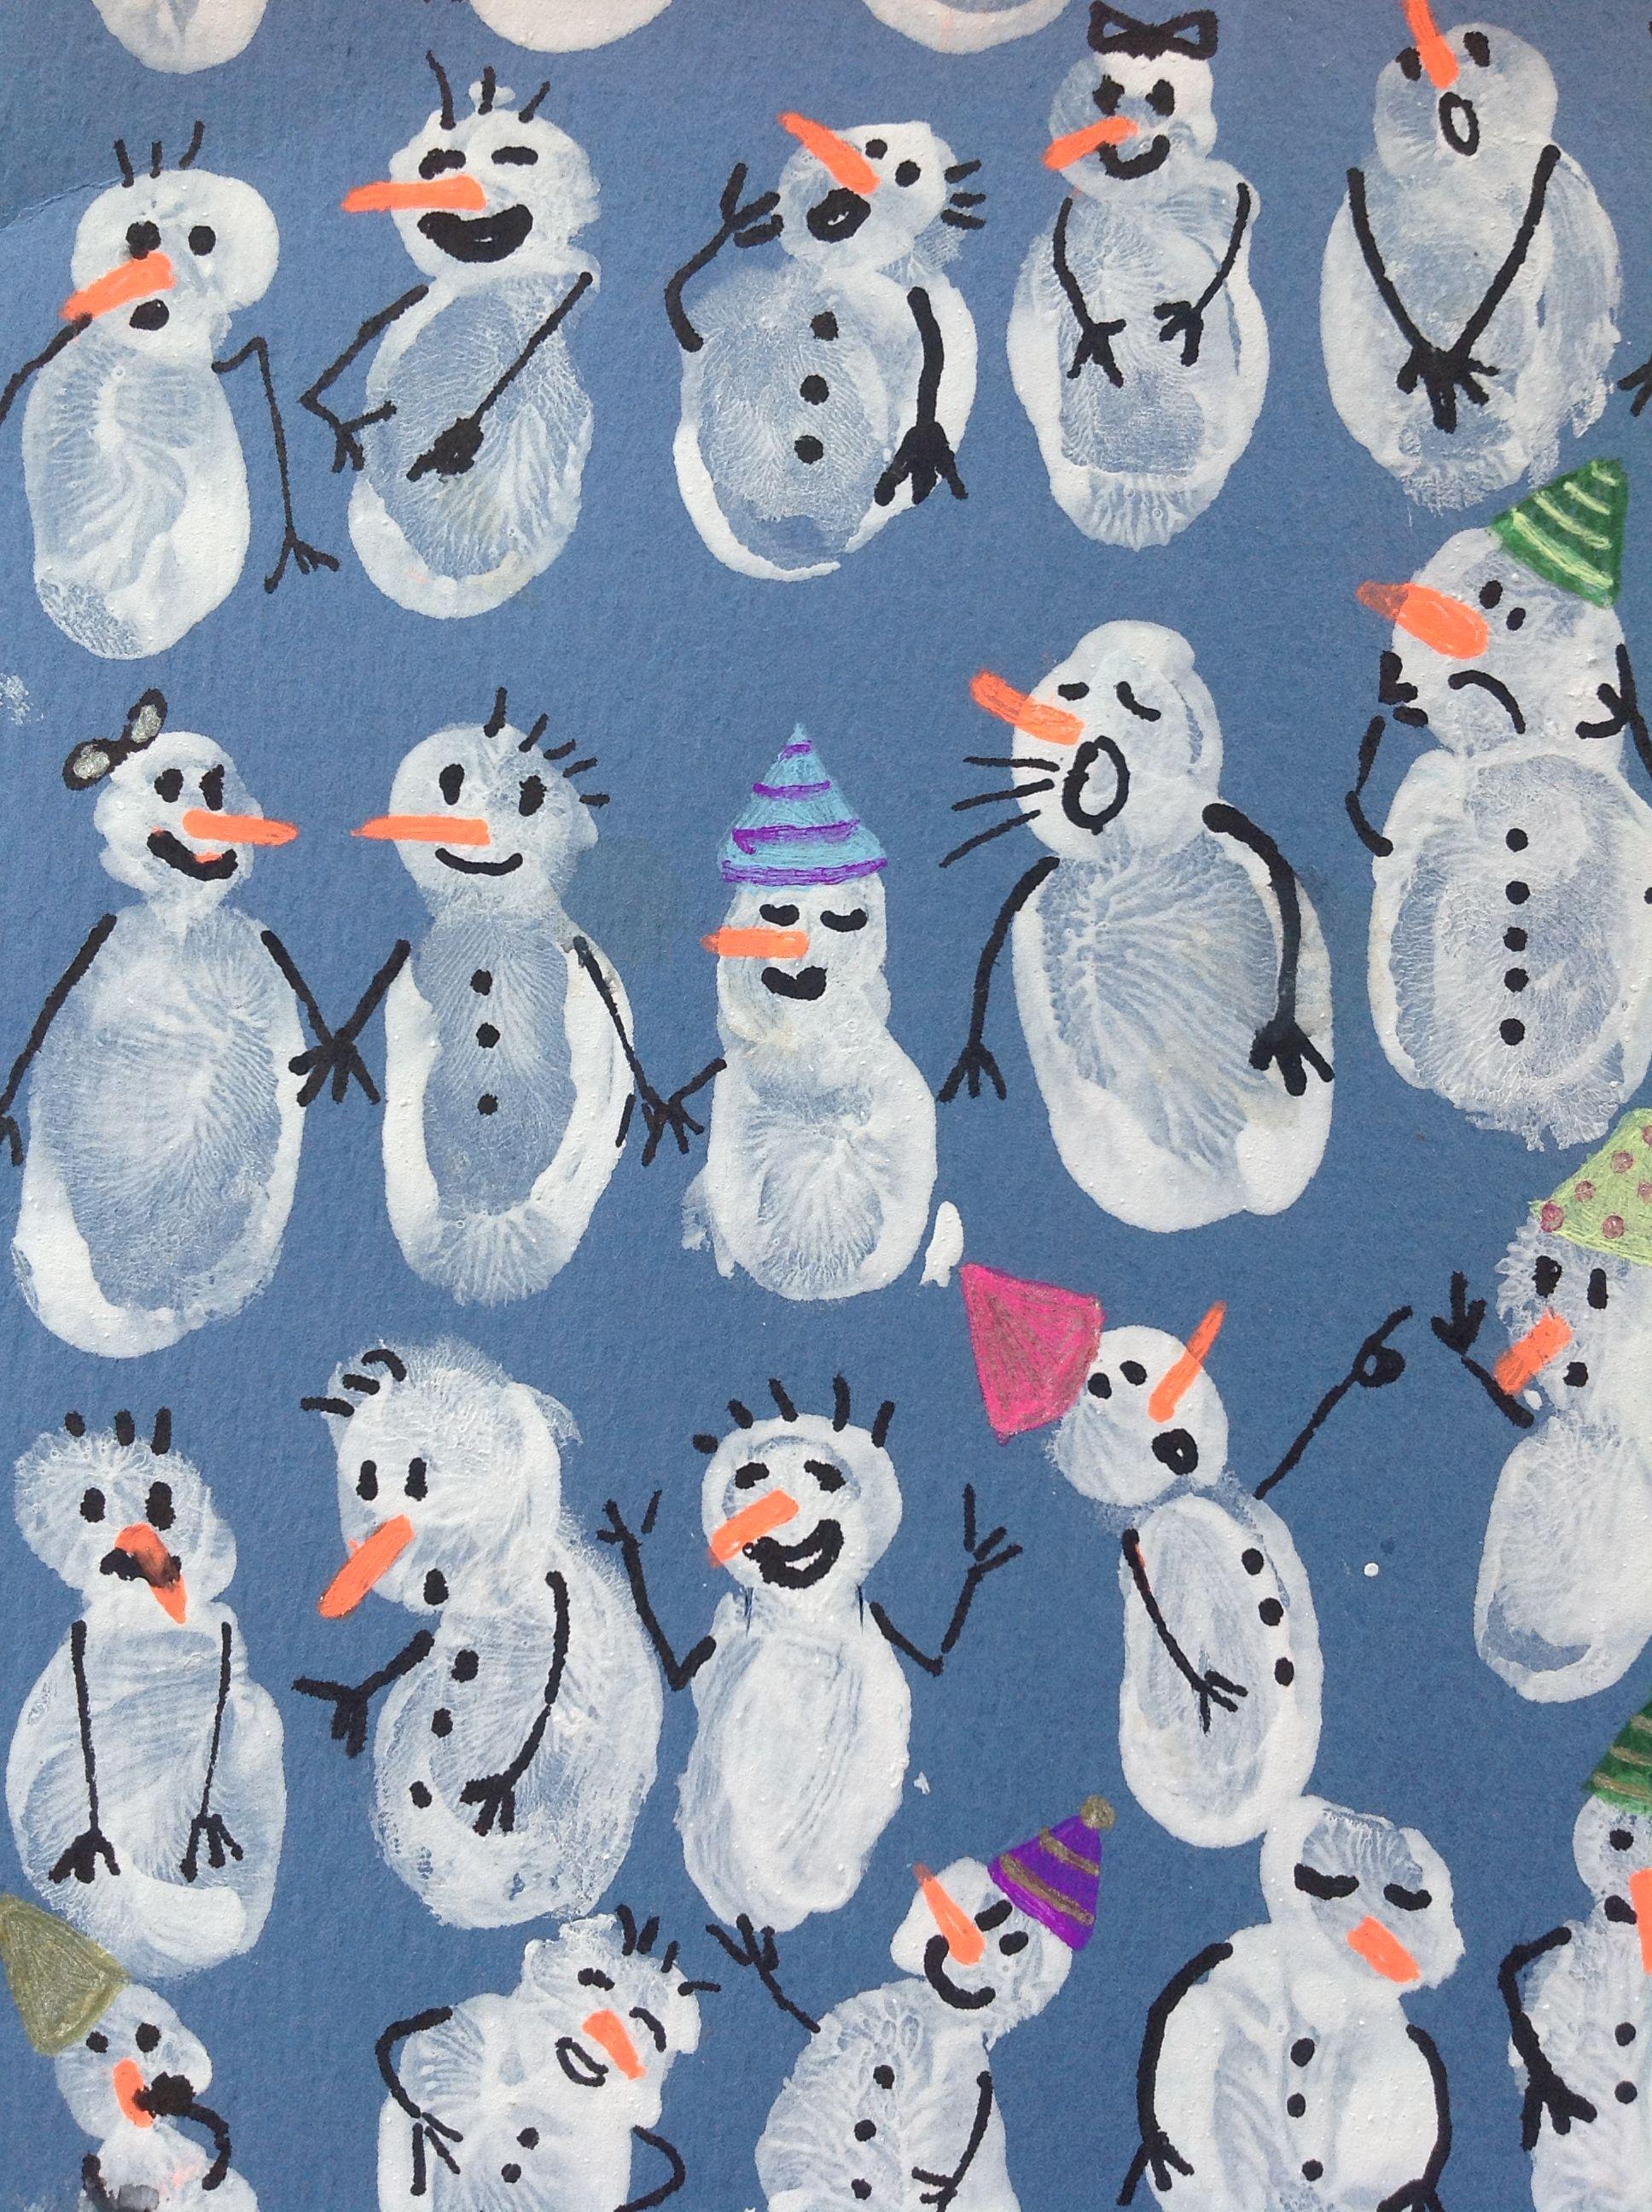 Empreintes Cute Wintertime Craft With Kids (& Adults) Fingerprint &